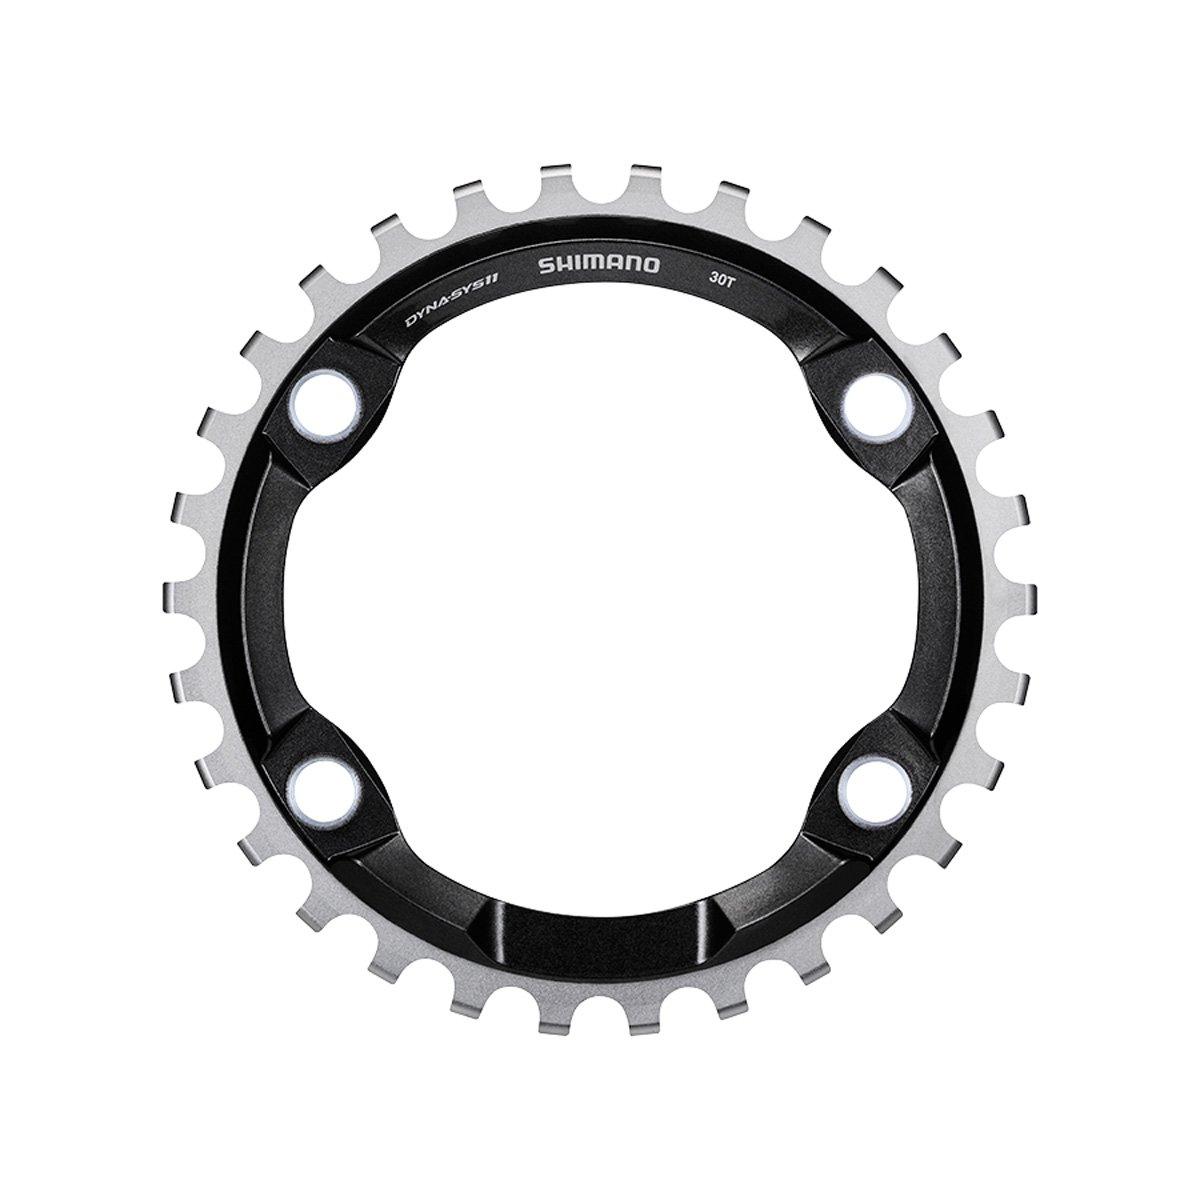 Shimano Deore XT m8000マウンテン自転車Chainring – sm-crm81 B01HOS949S1色 32T